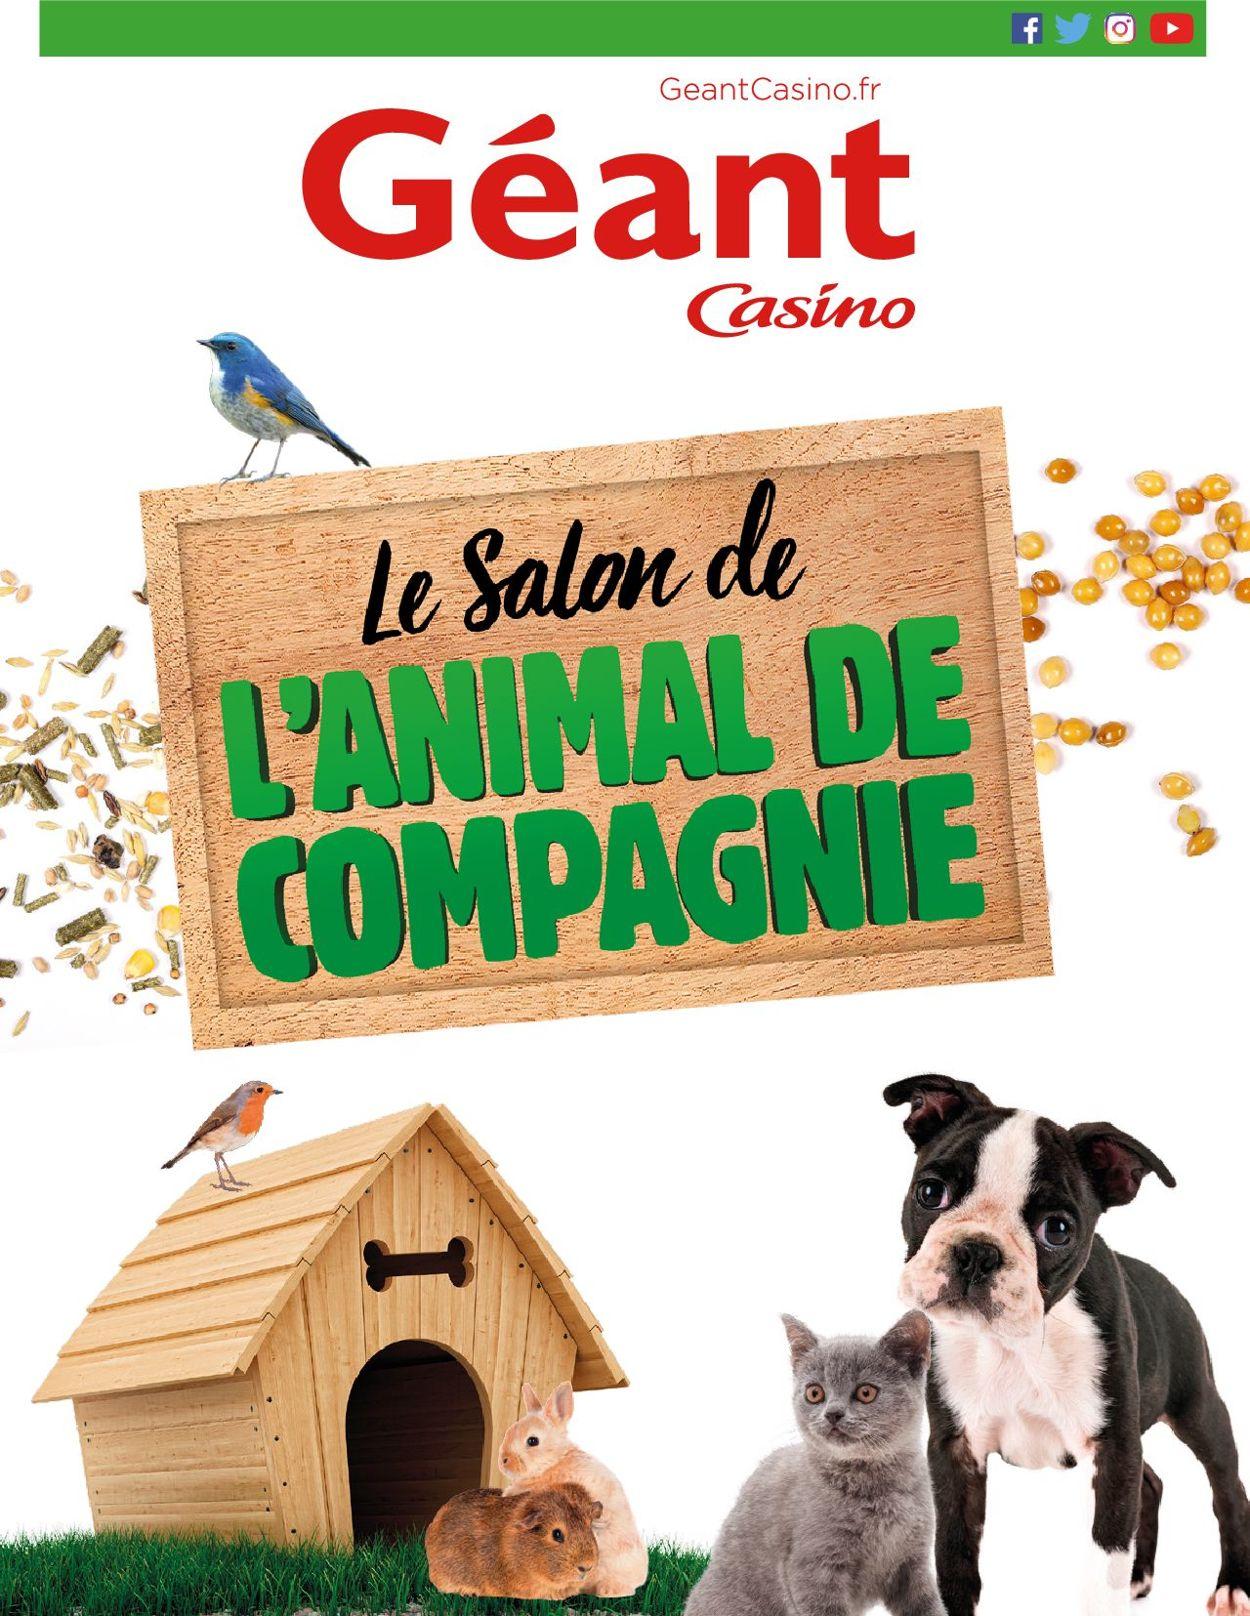 Géant Casino Catalogue - 11.06-23.06.2019